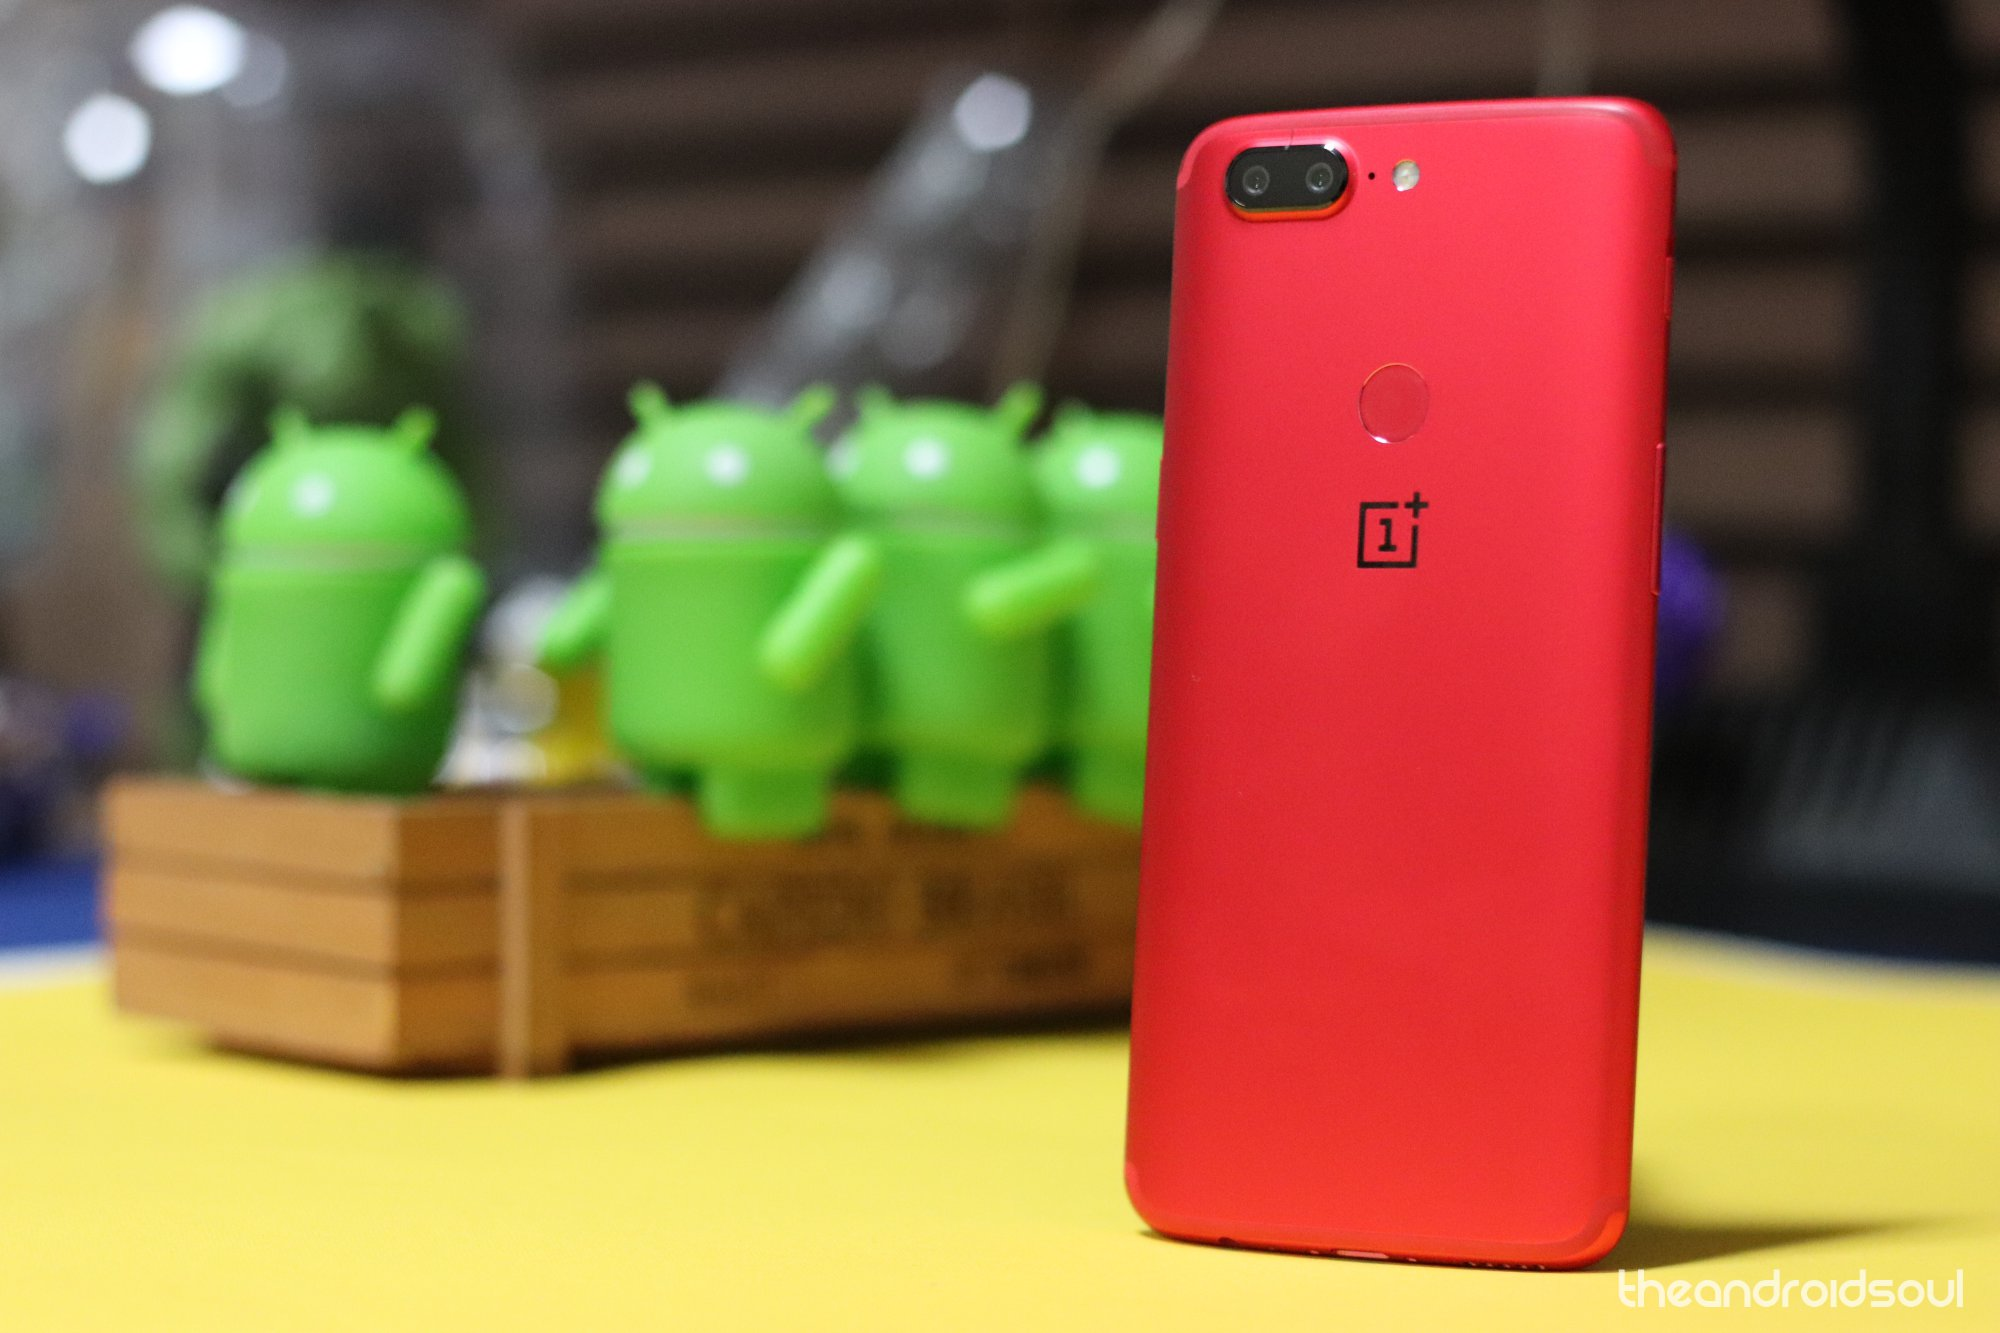 OnePlus-5T-pie-update-release